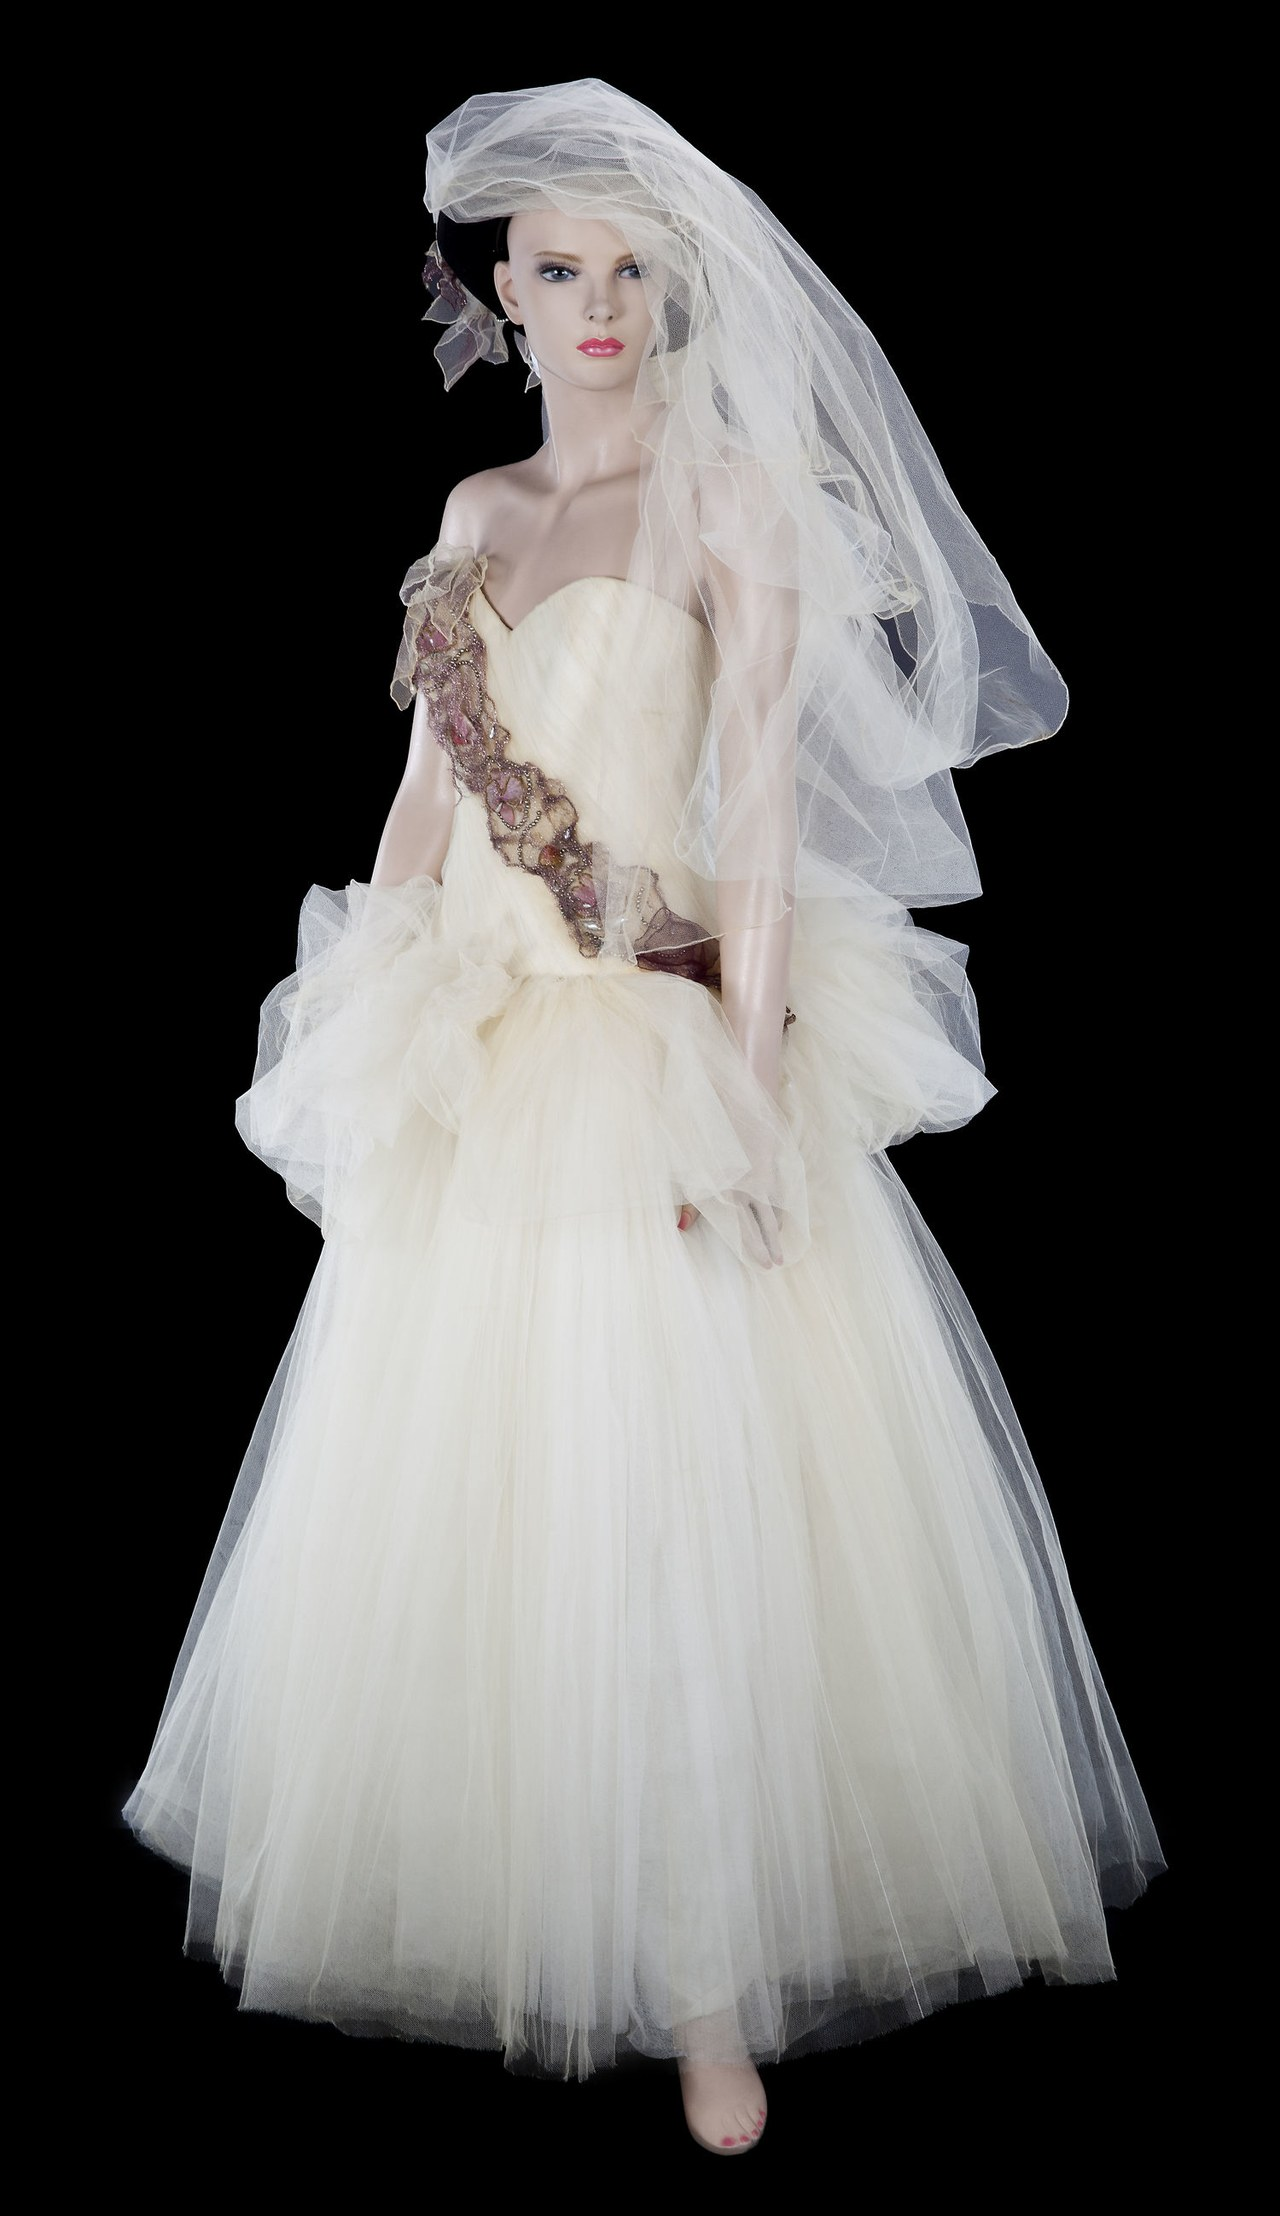 madonna wedding dresses photo - 1